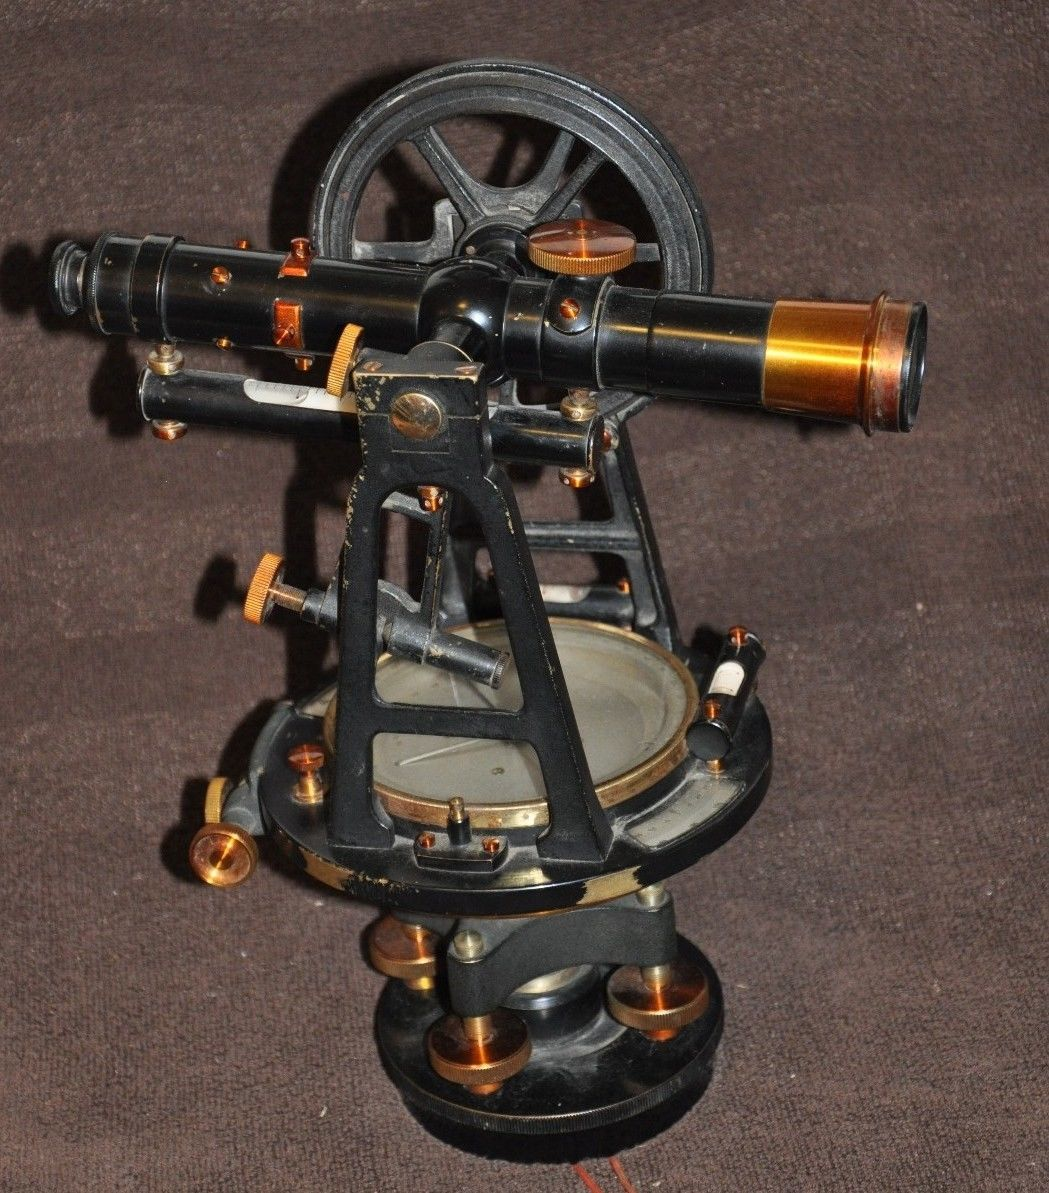 Black Dietzgen Brass Transit Land Surveyor with Compass 1928